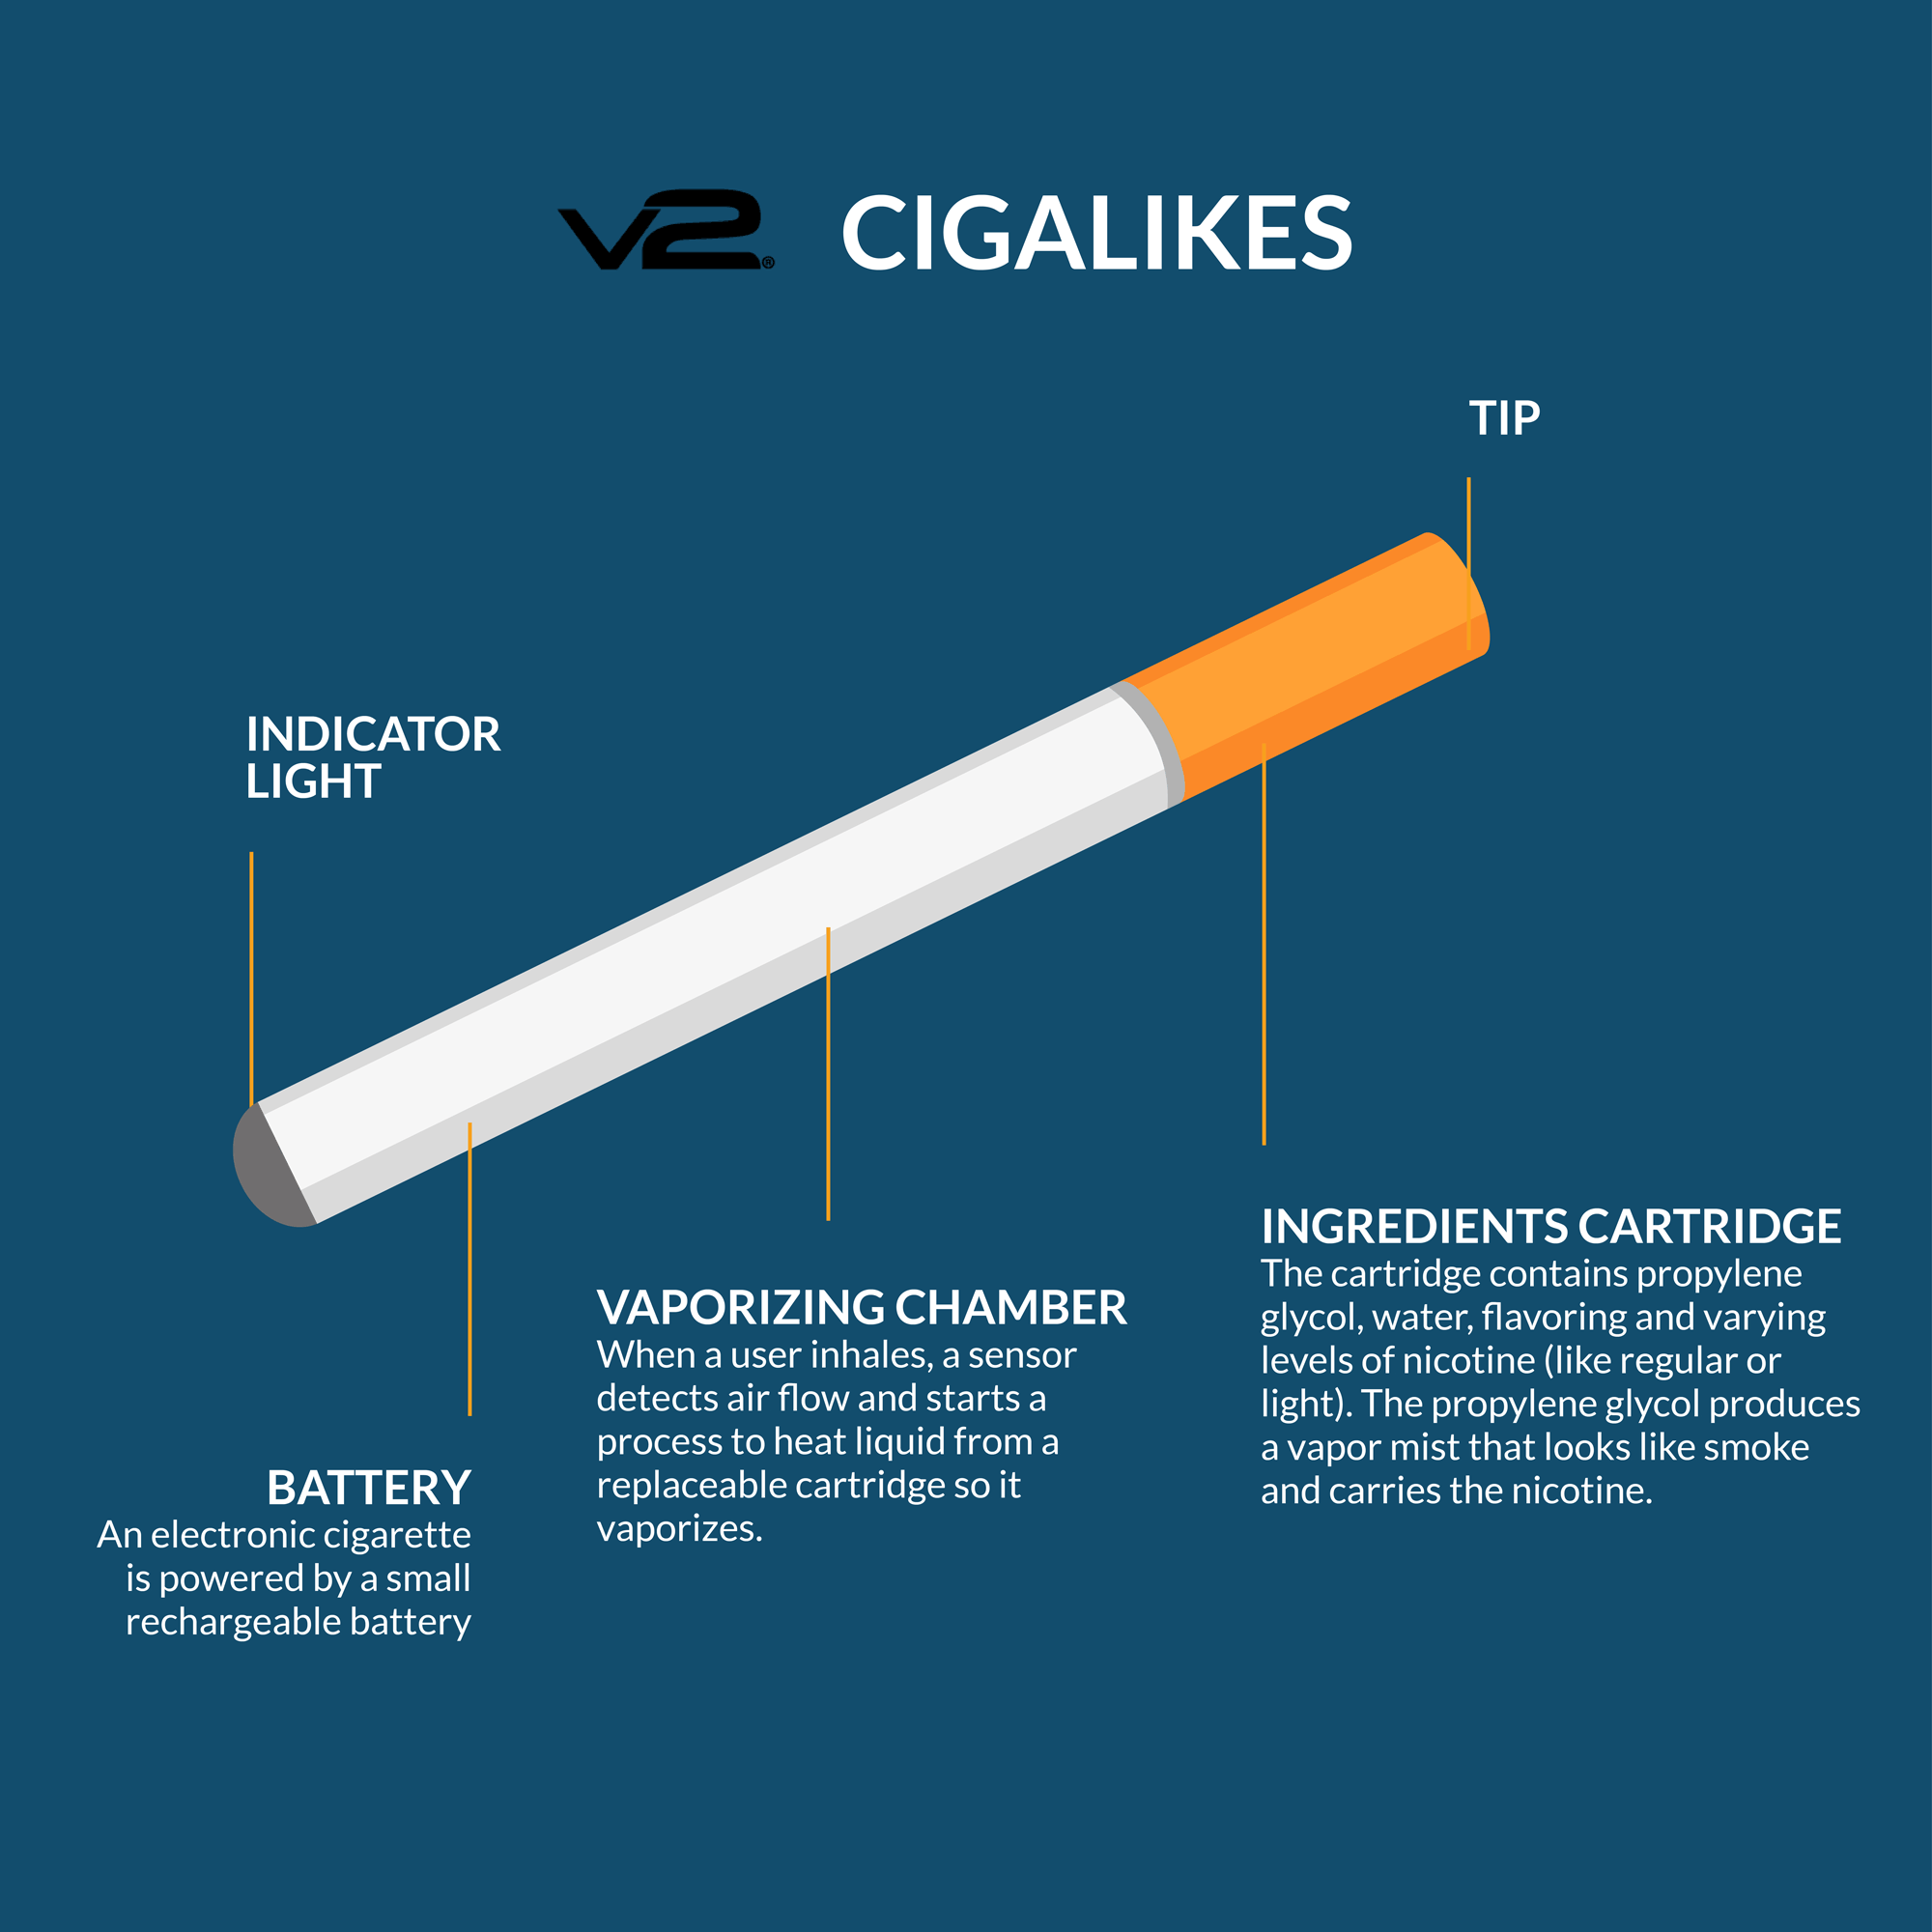 Device type – Cigalikes